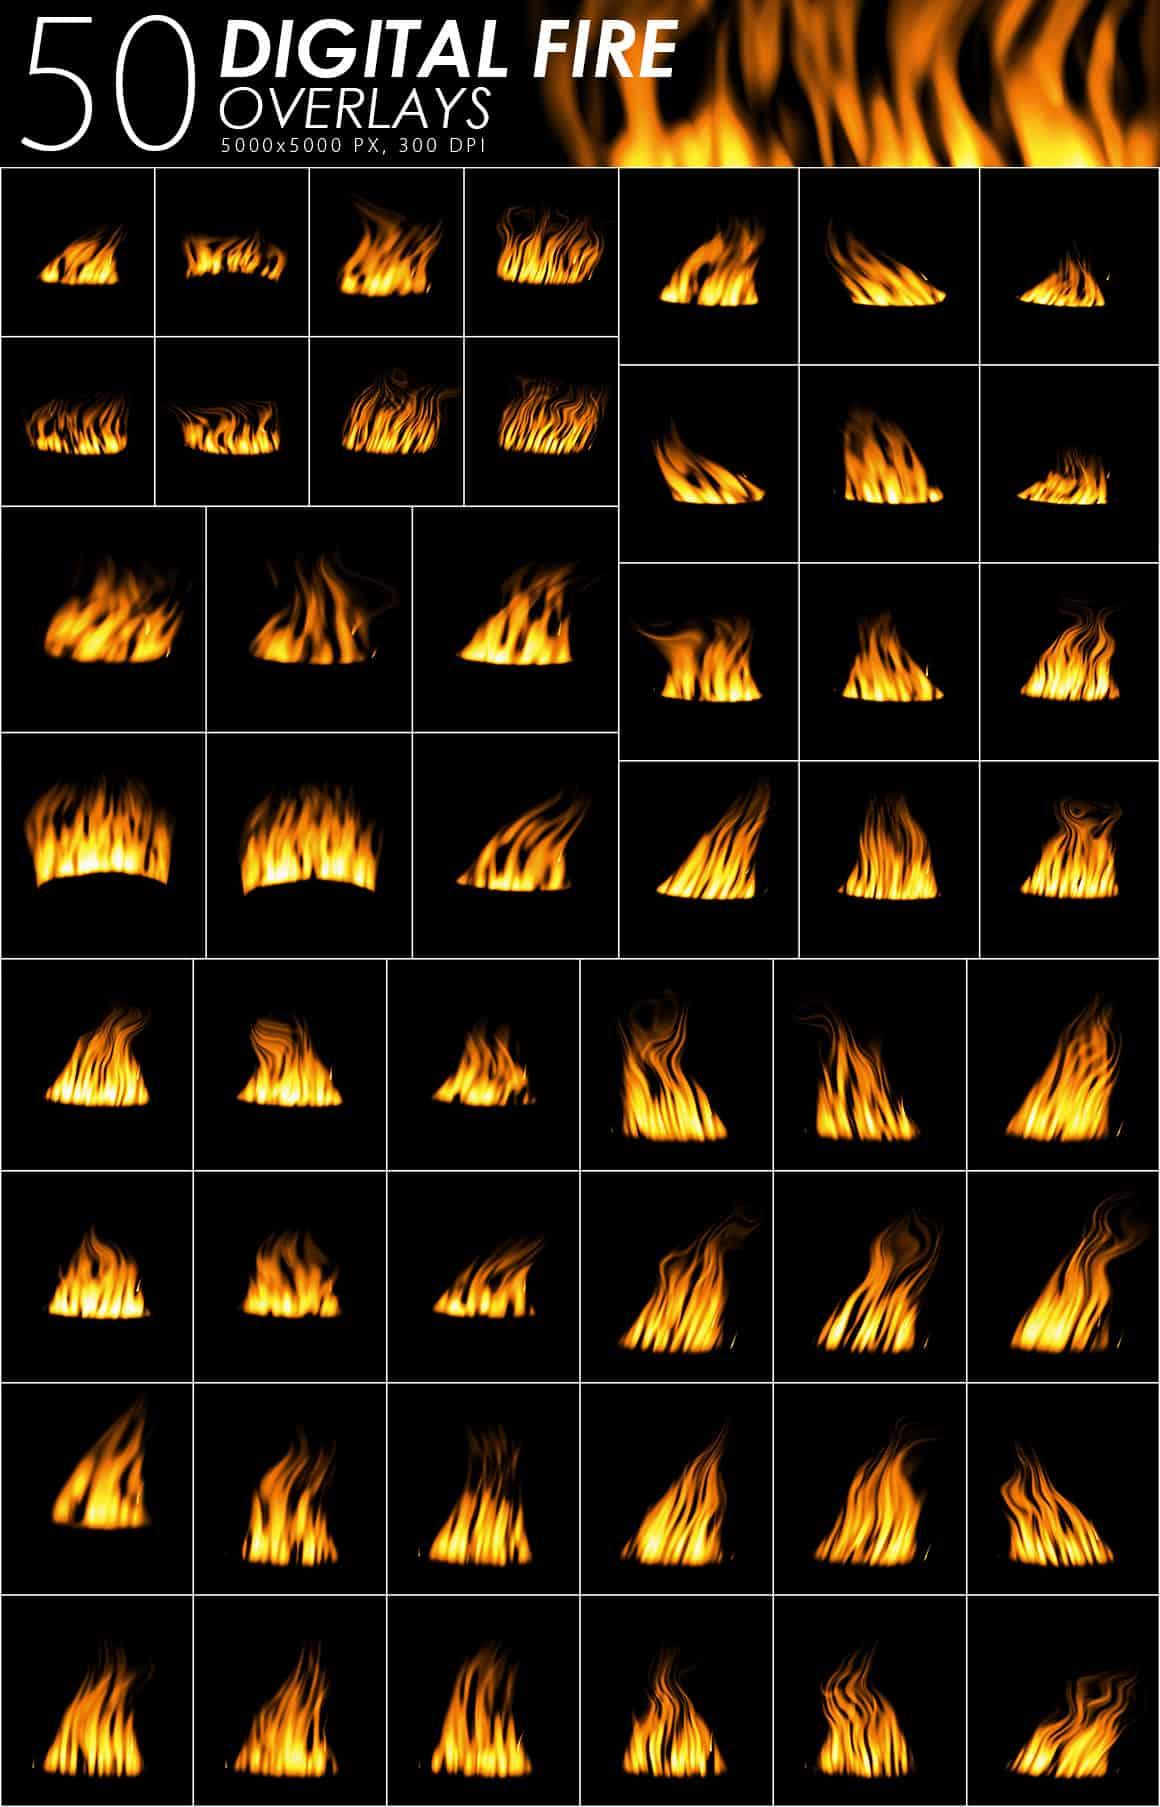 575 Fire, Smoke, Fog Overlays - just $15 - Digital Fire prev min